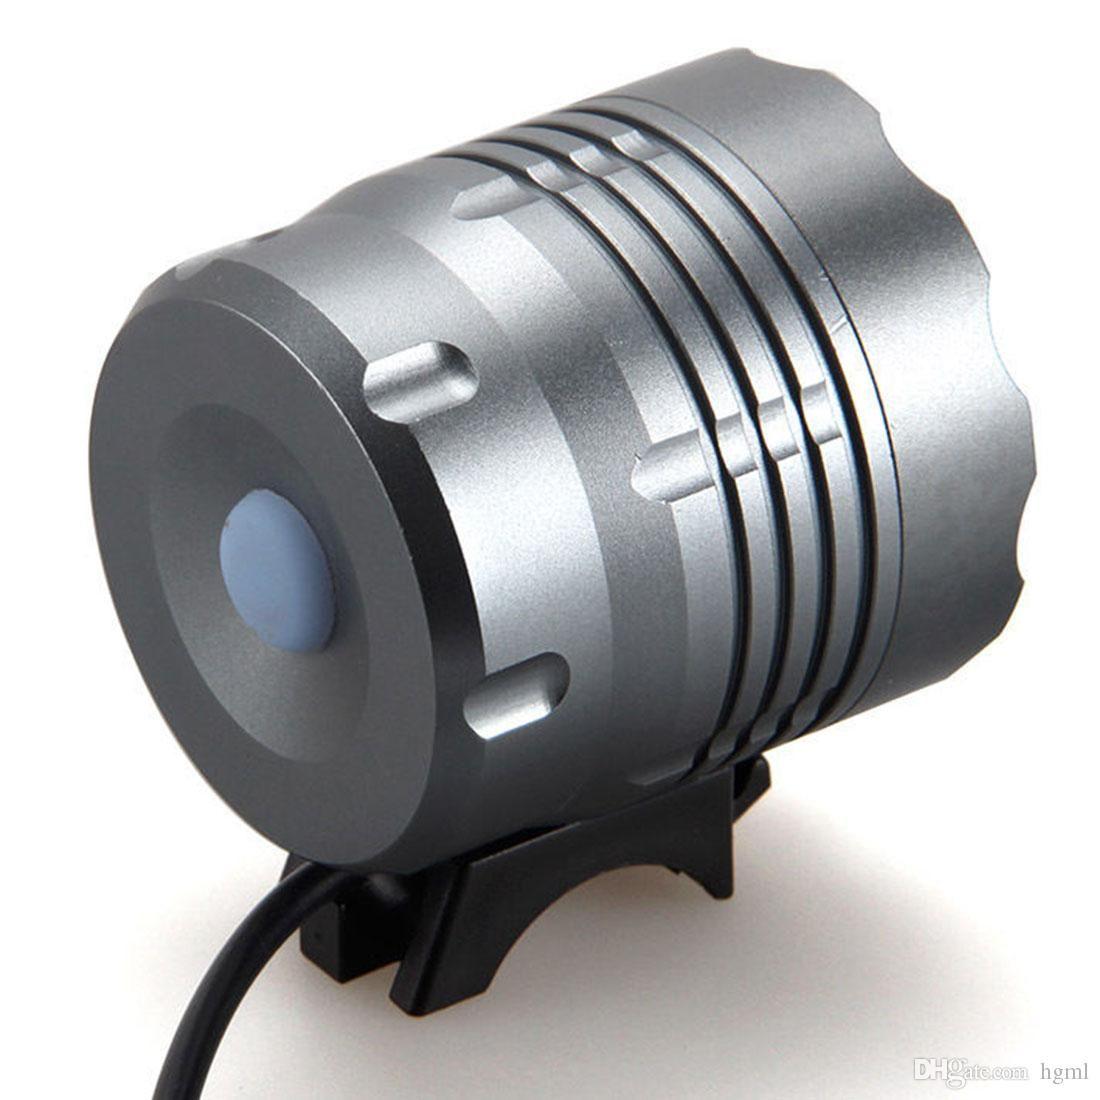 Waterproof 8000Lm 5x CREE XM-L U2 LED Front Bicycle Light Bike Headlamp Head Lamp Headlight for Camping Fishing Caving BLL_007